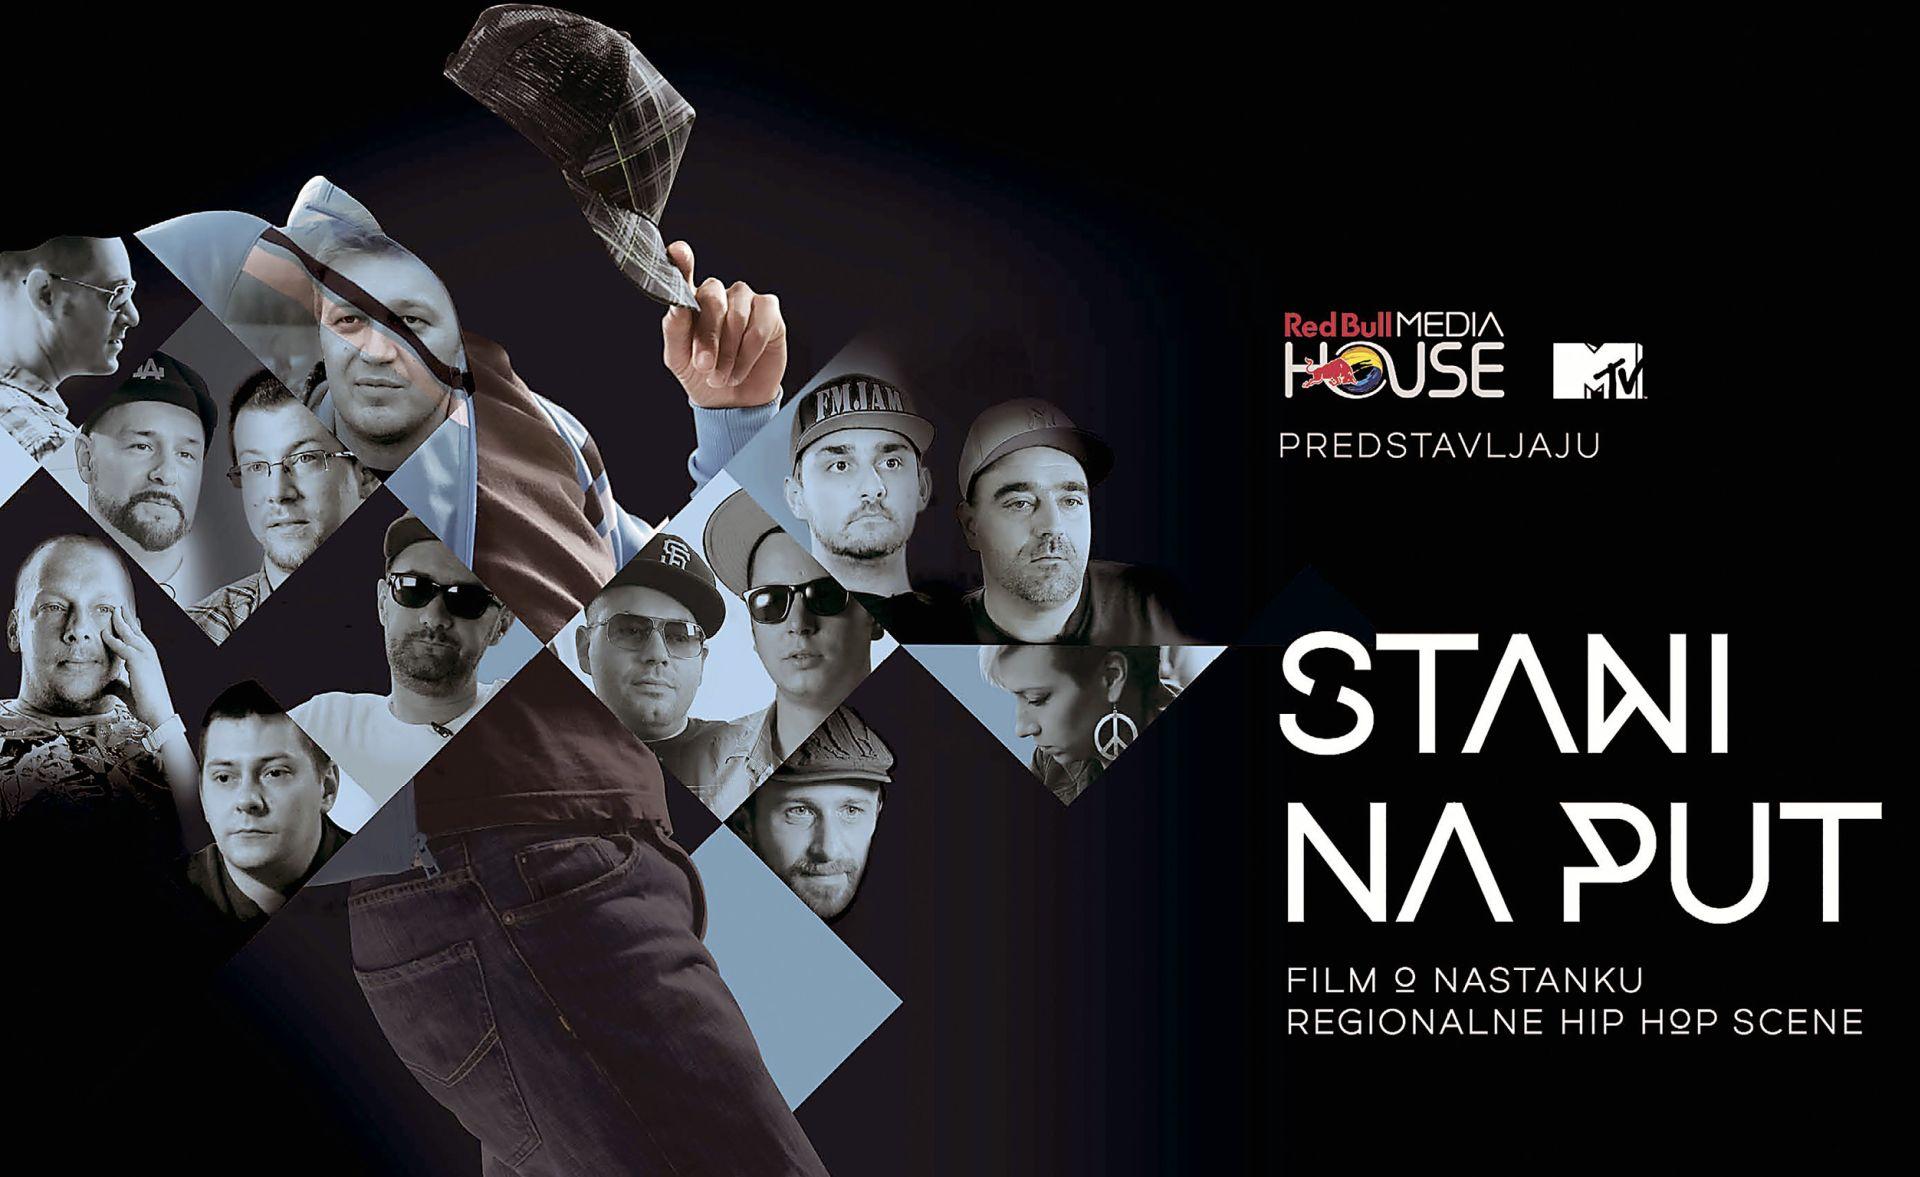 Nedorasli autori dokumentarca  posvađali balkansku hip hop scenu